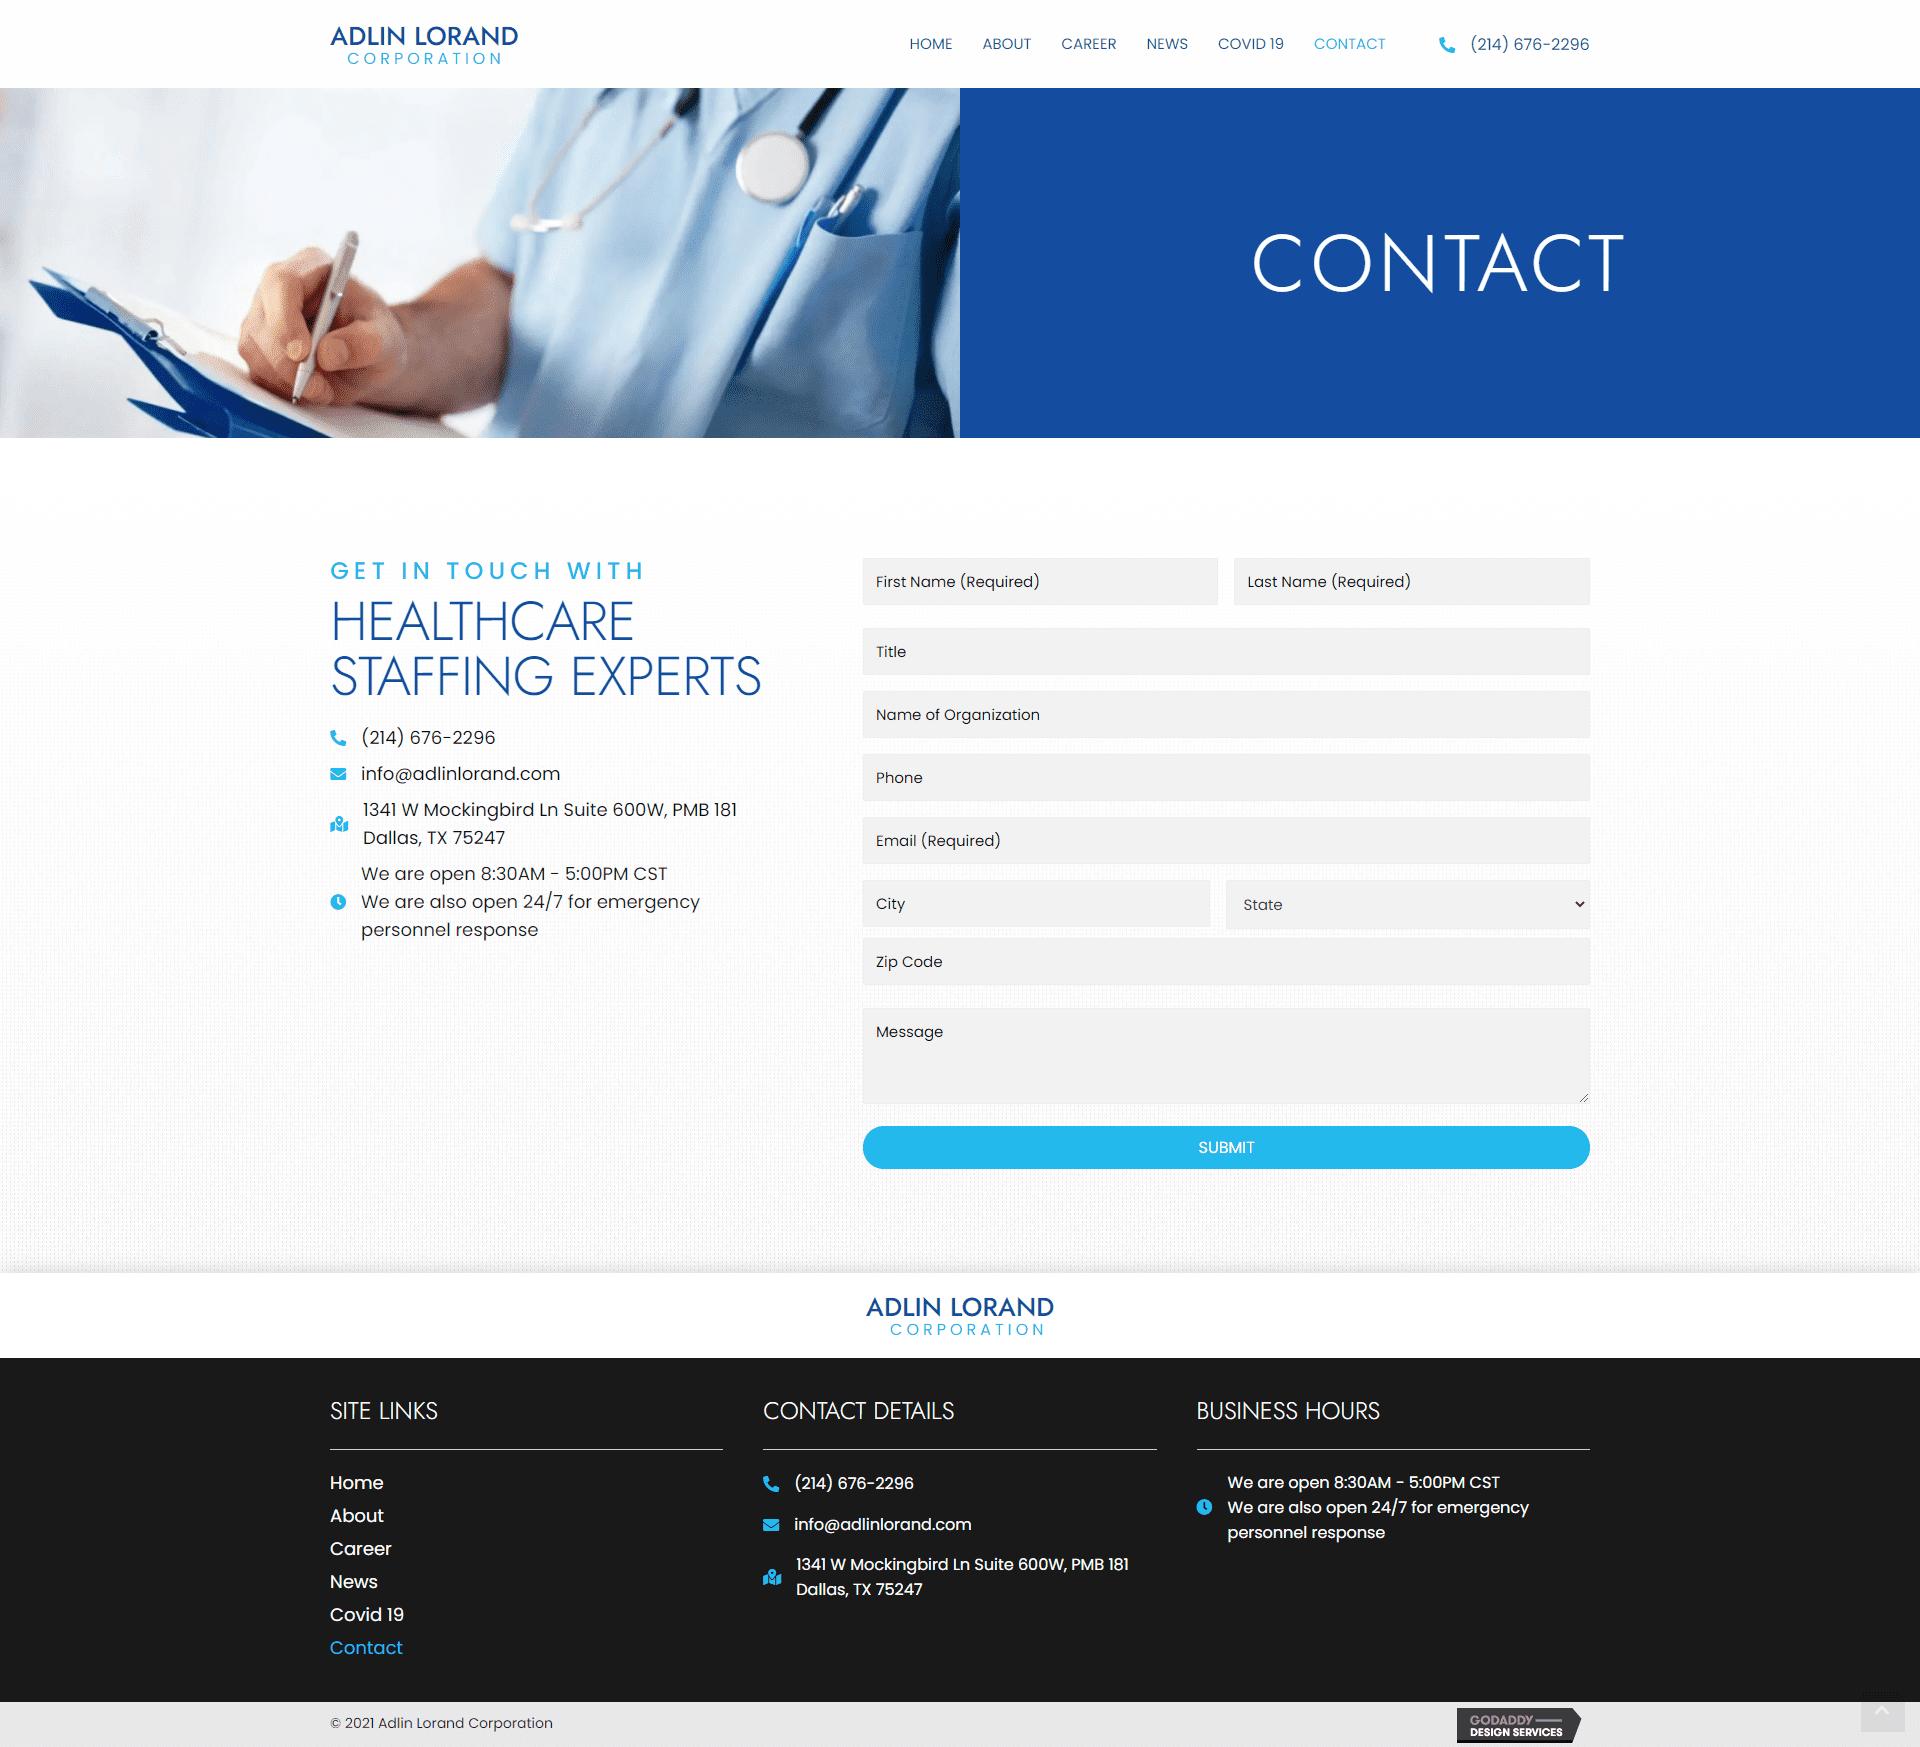 Adlin Lorand Corporation Contact